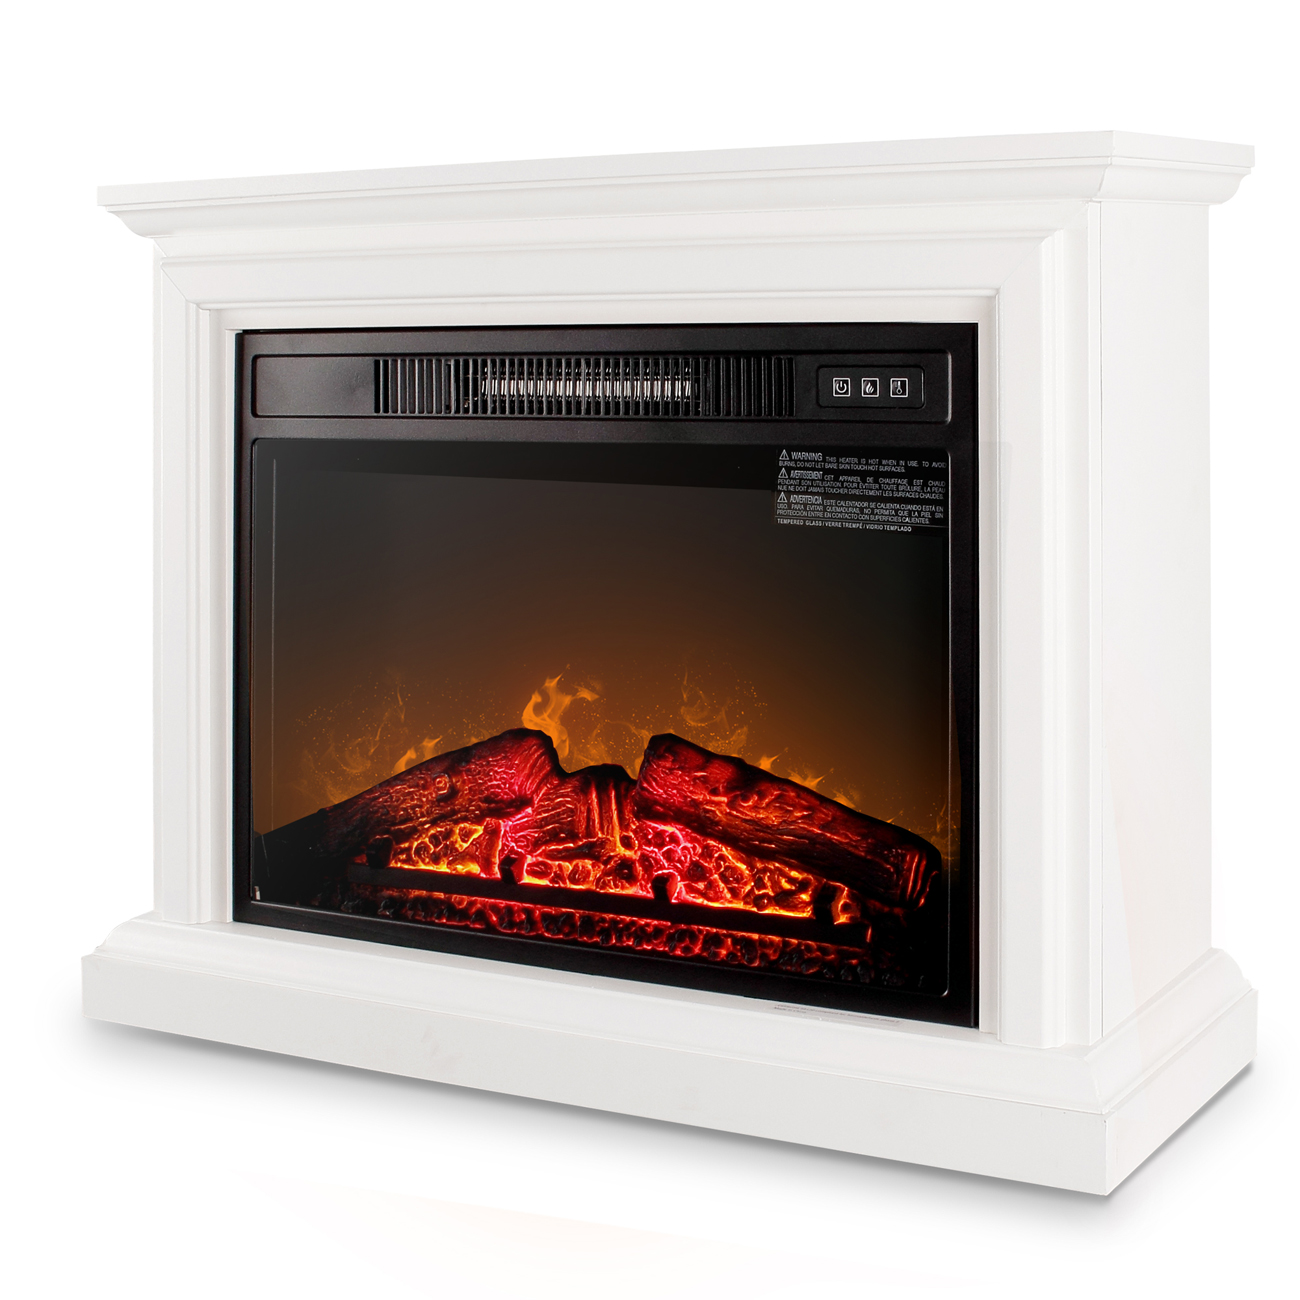 Della 1400W Infrared Quartz Deluxe Insert Fireplace Heater ...